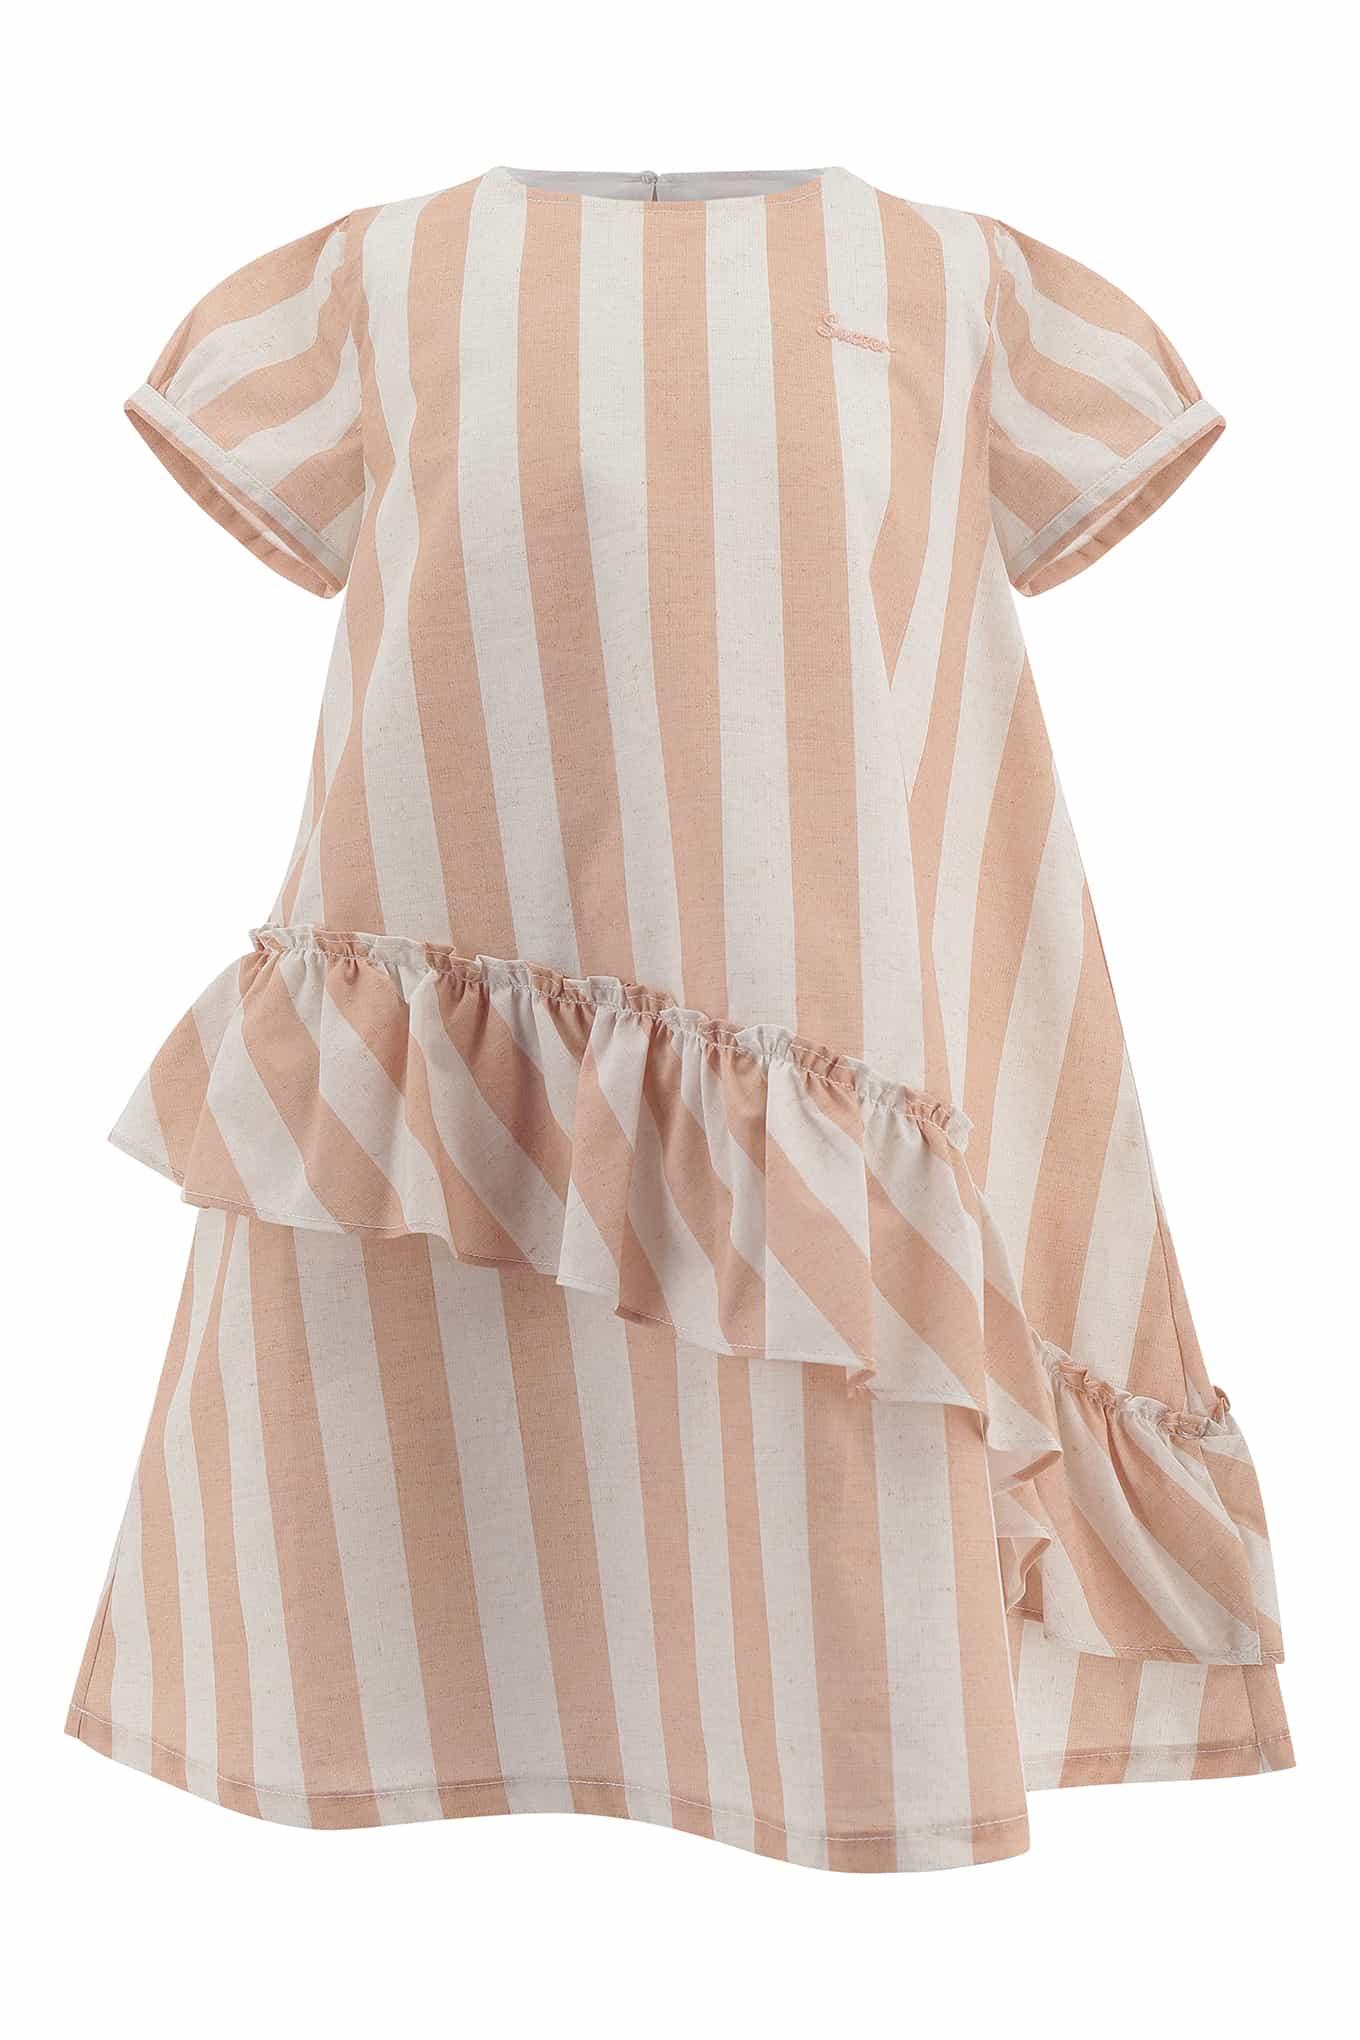 Dress Light Pink Casual Girl